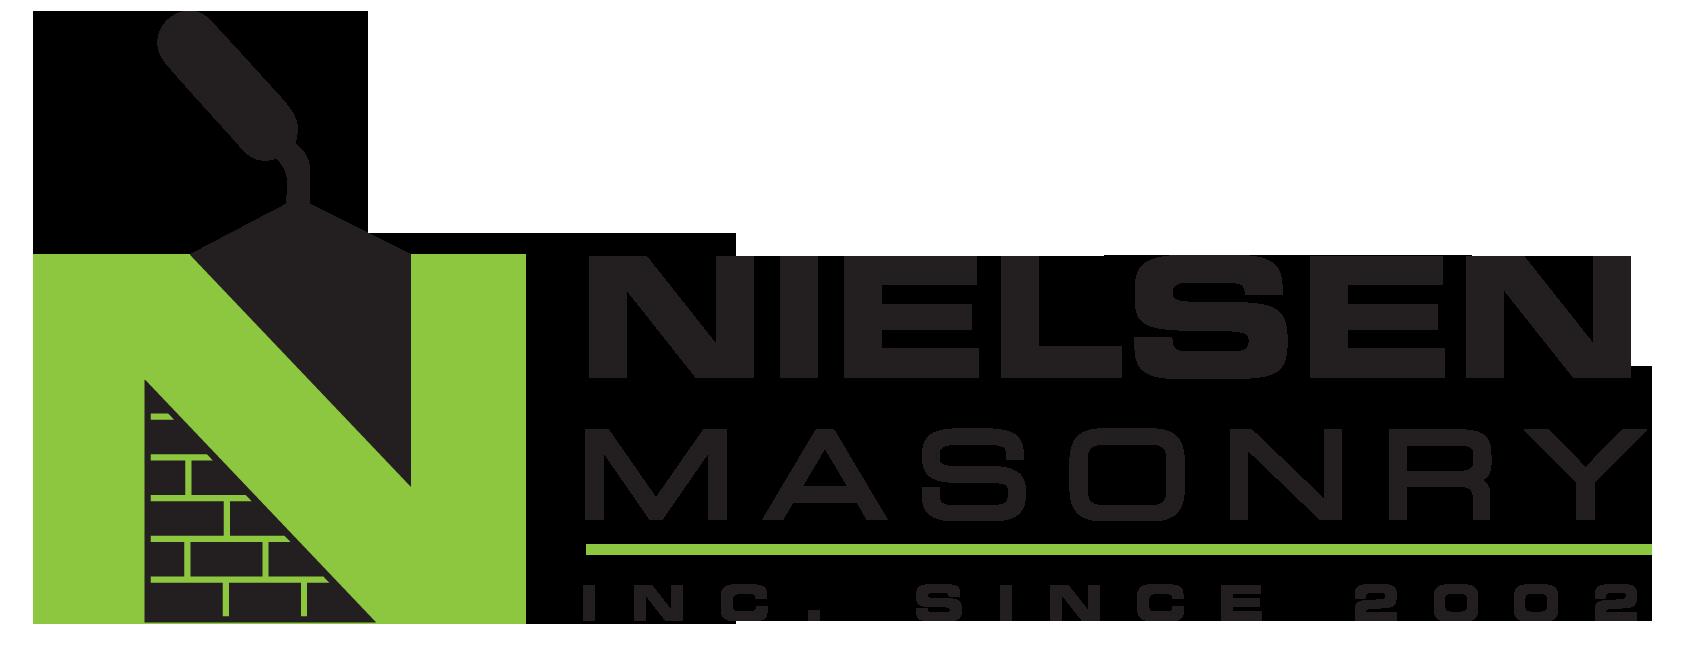 Nielsen Masonry - Masonry Contractor in Vancouver, WA